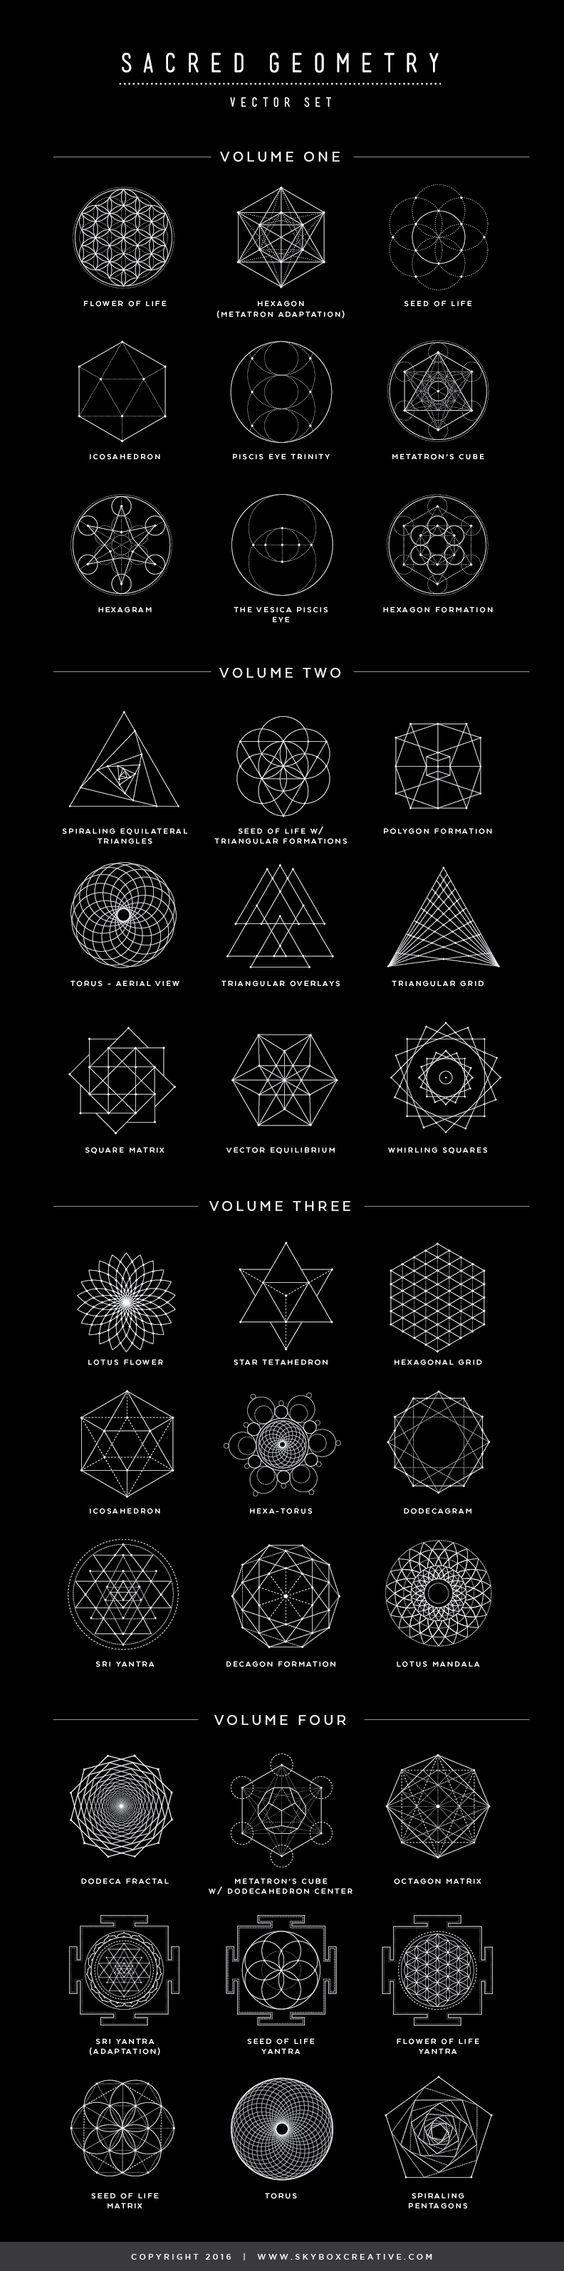 Pin By Divya Bherwani On Universe Tattoo Pinterest Sacred